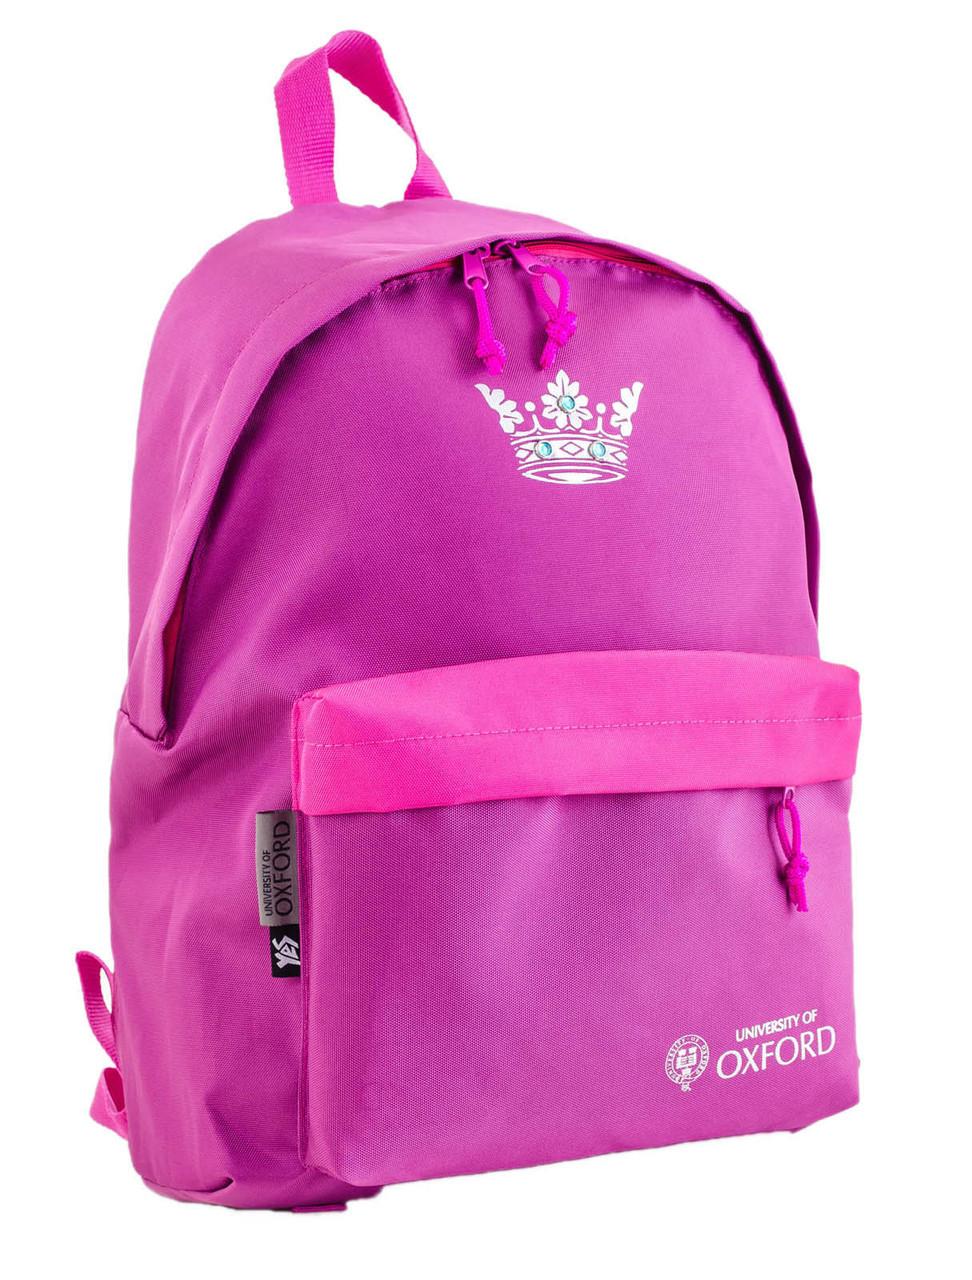 Рюкзак подростковый Yes OX-15 Oxford 553478